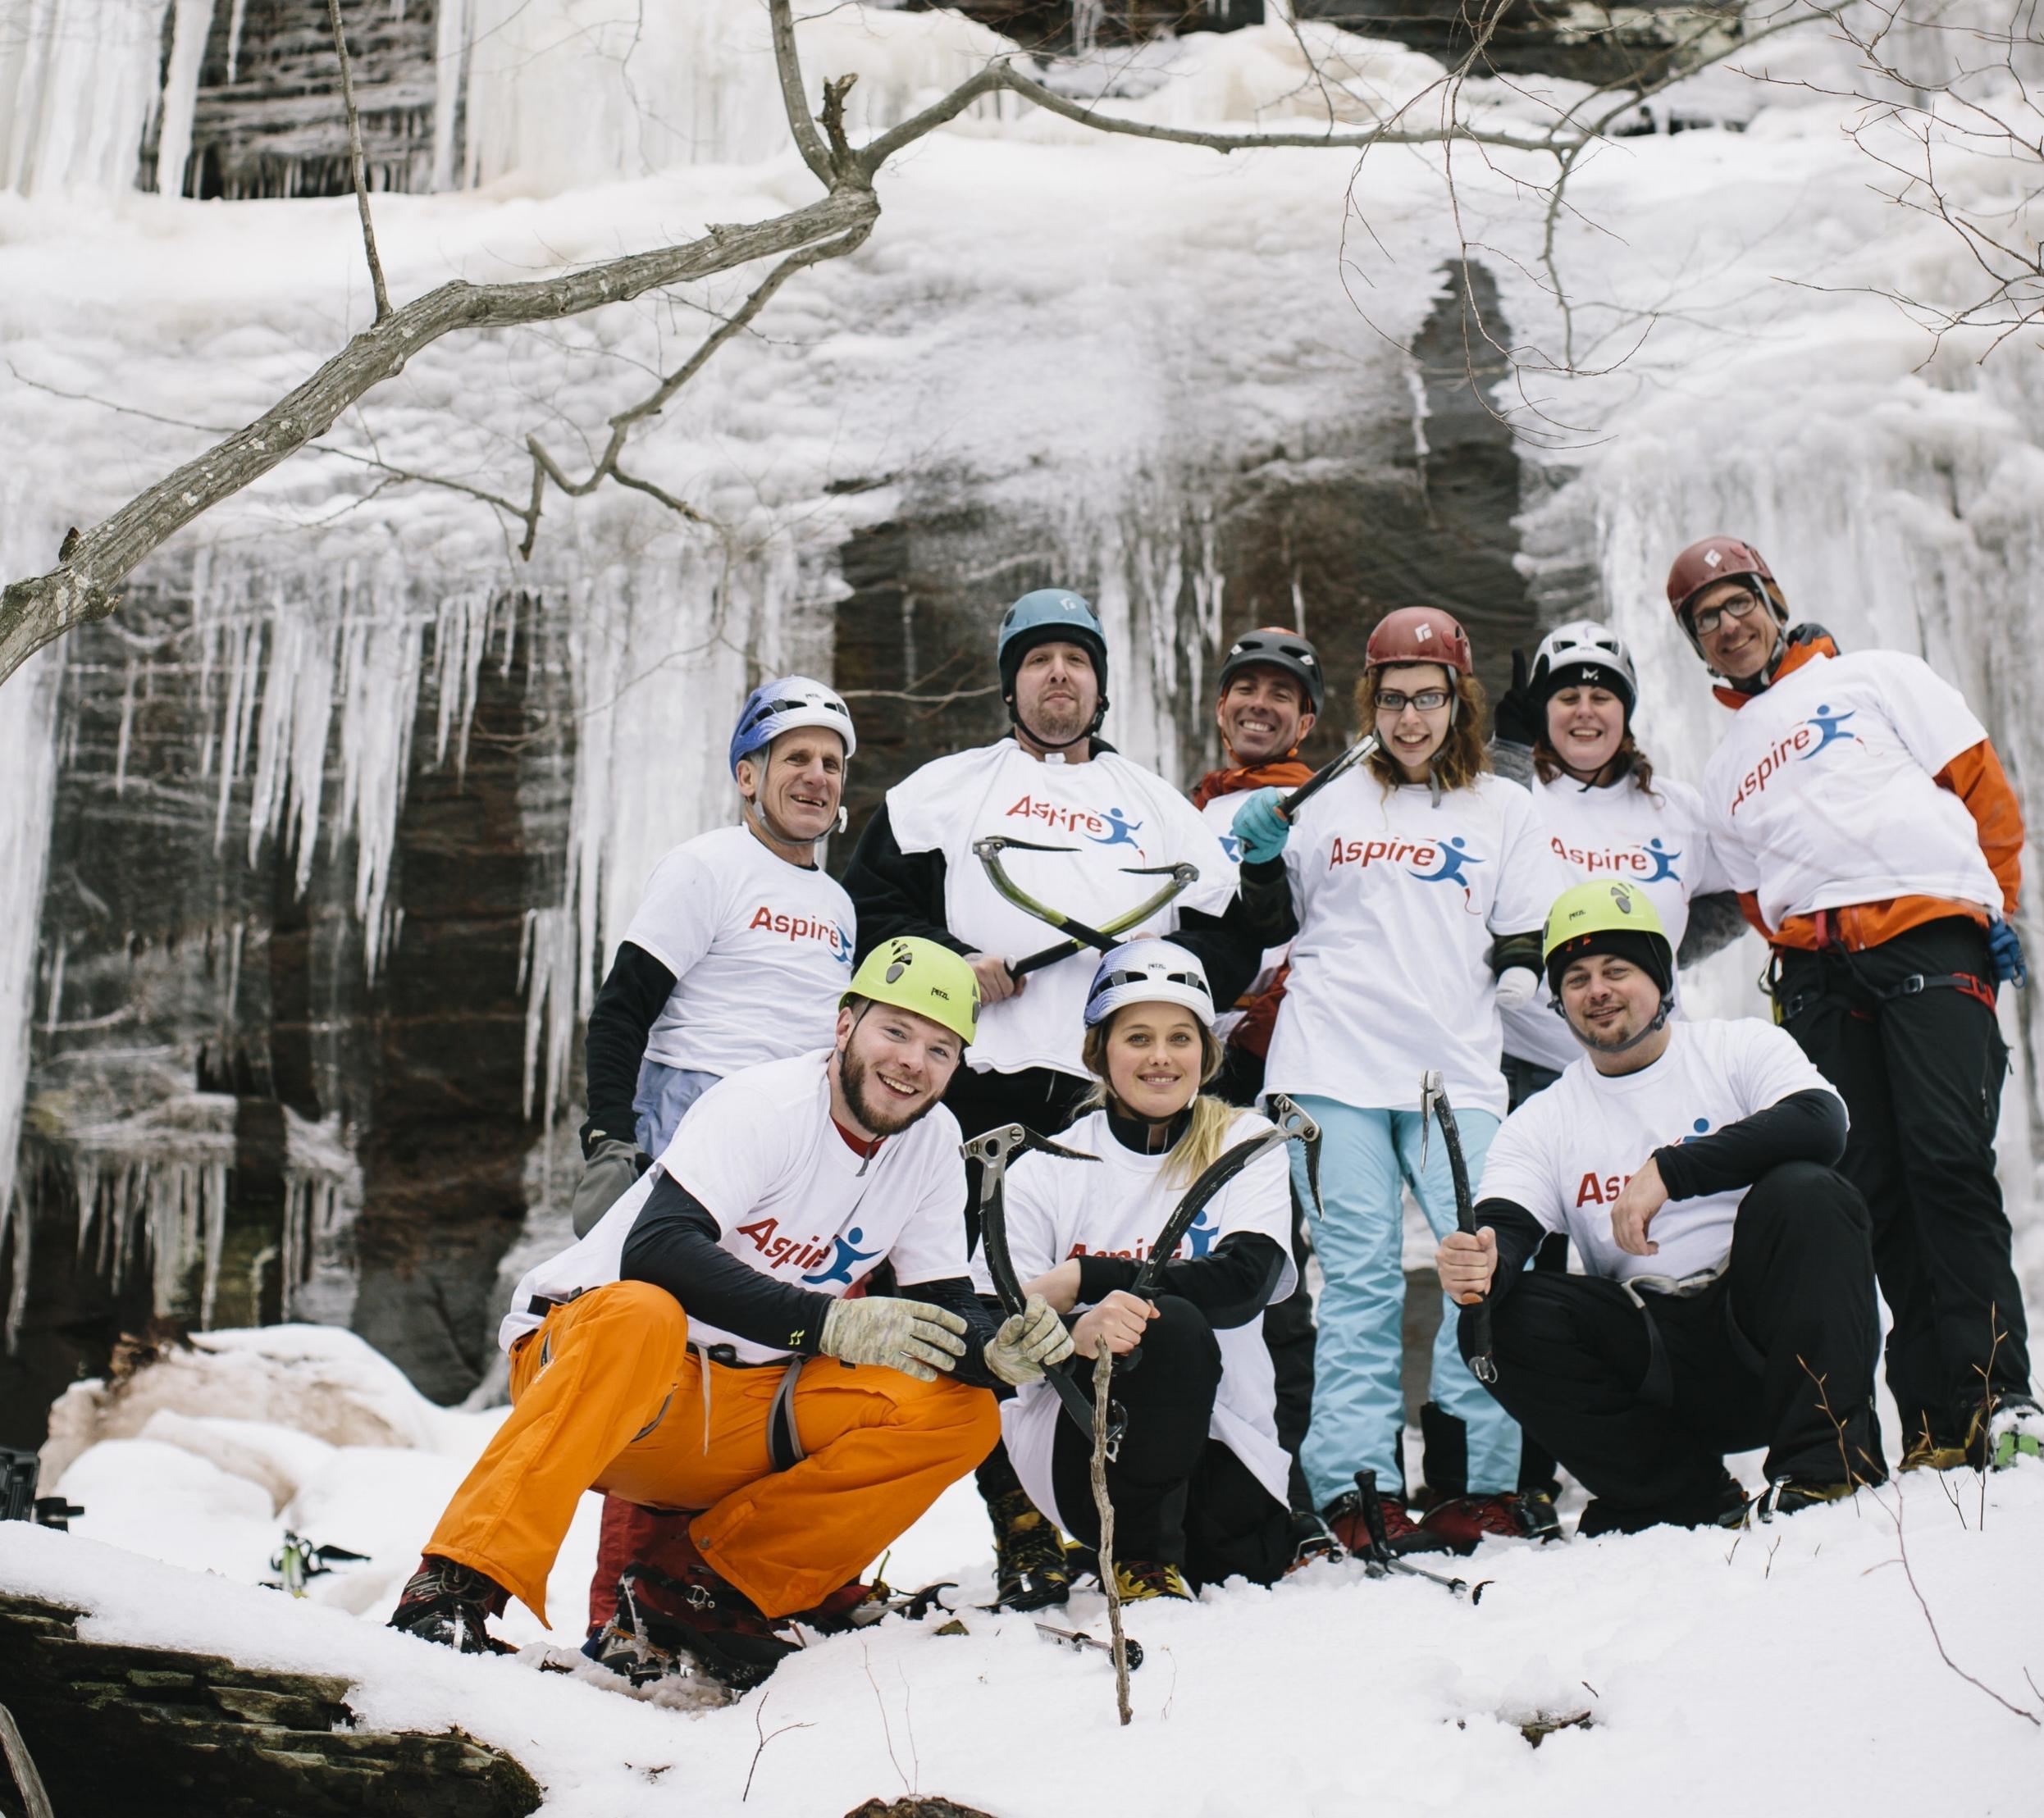 Ice Climbing in the Catskills -